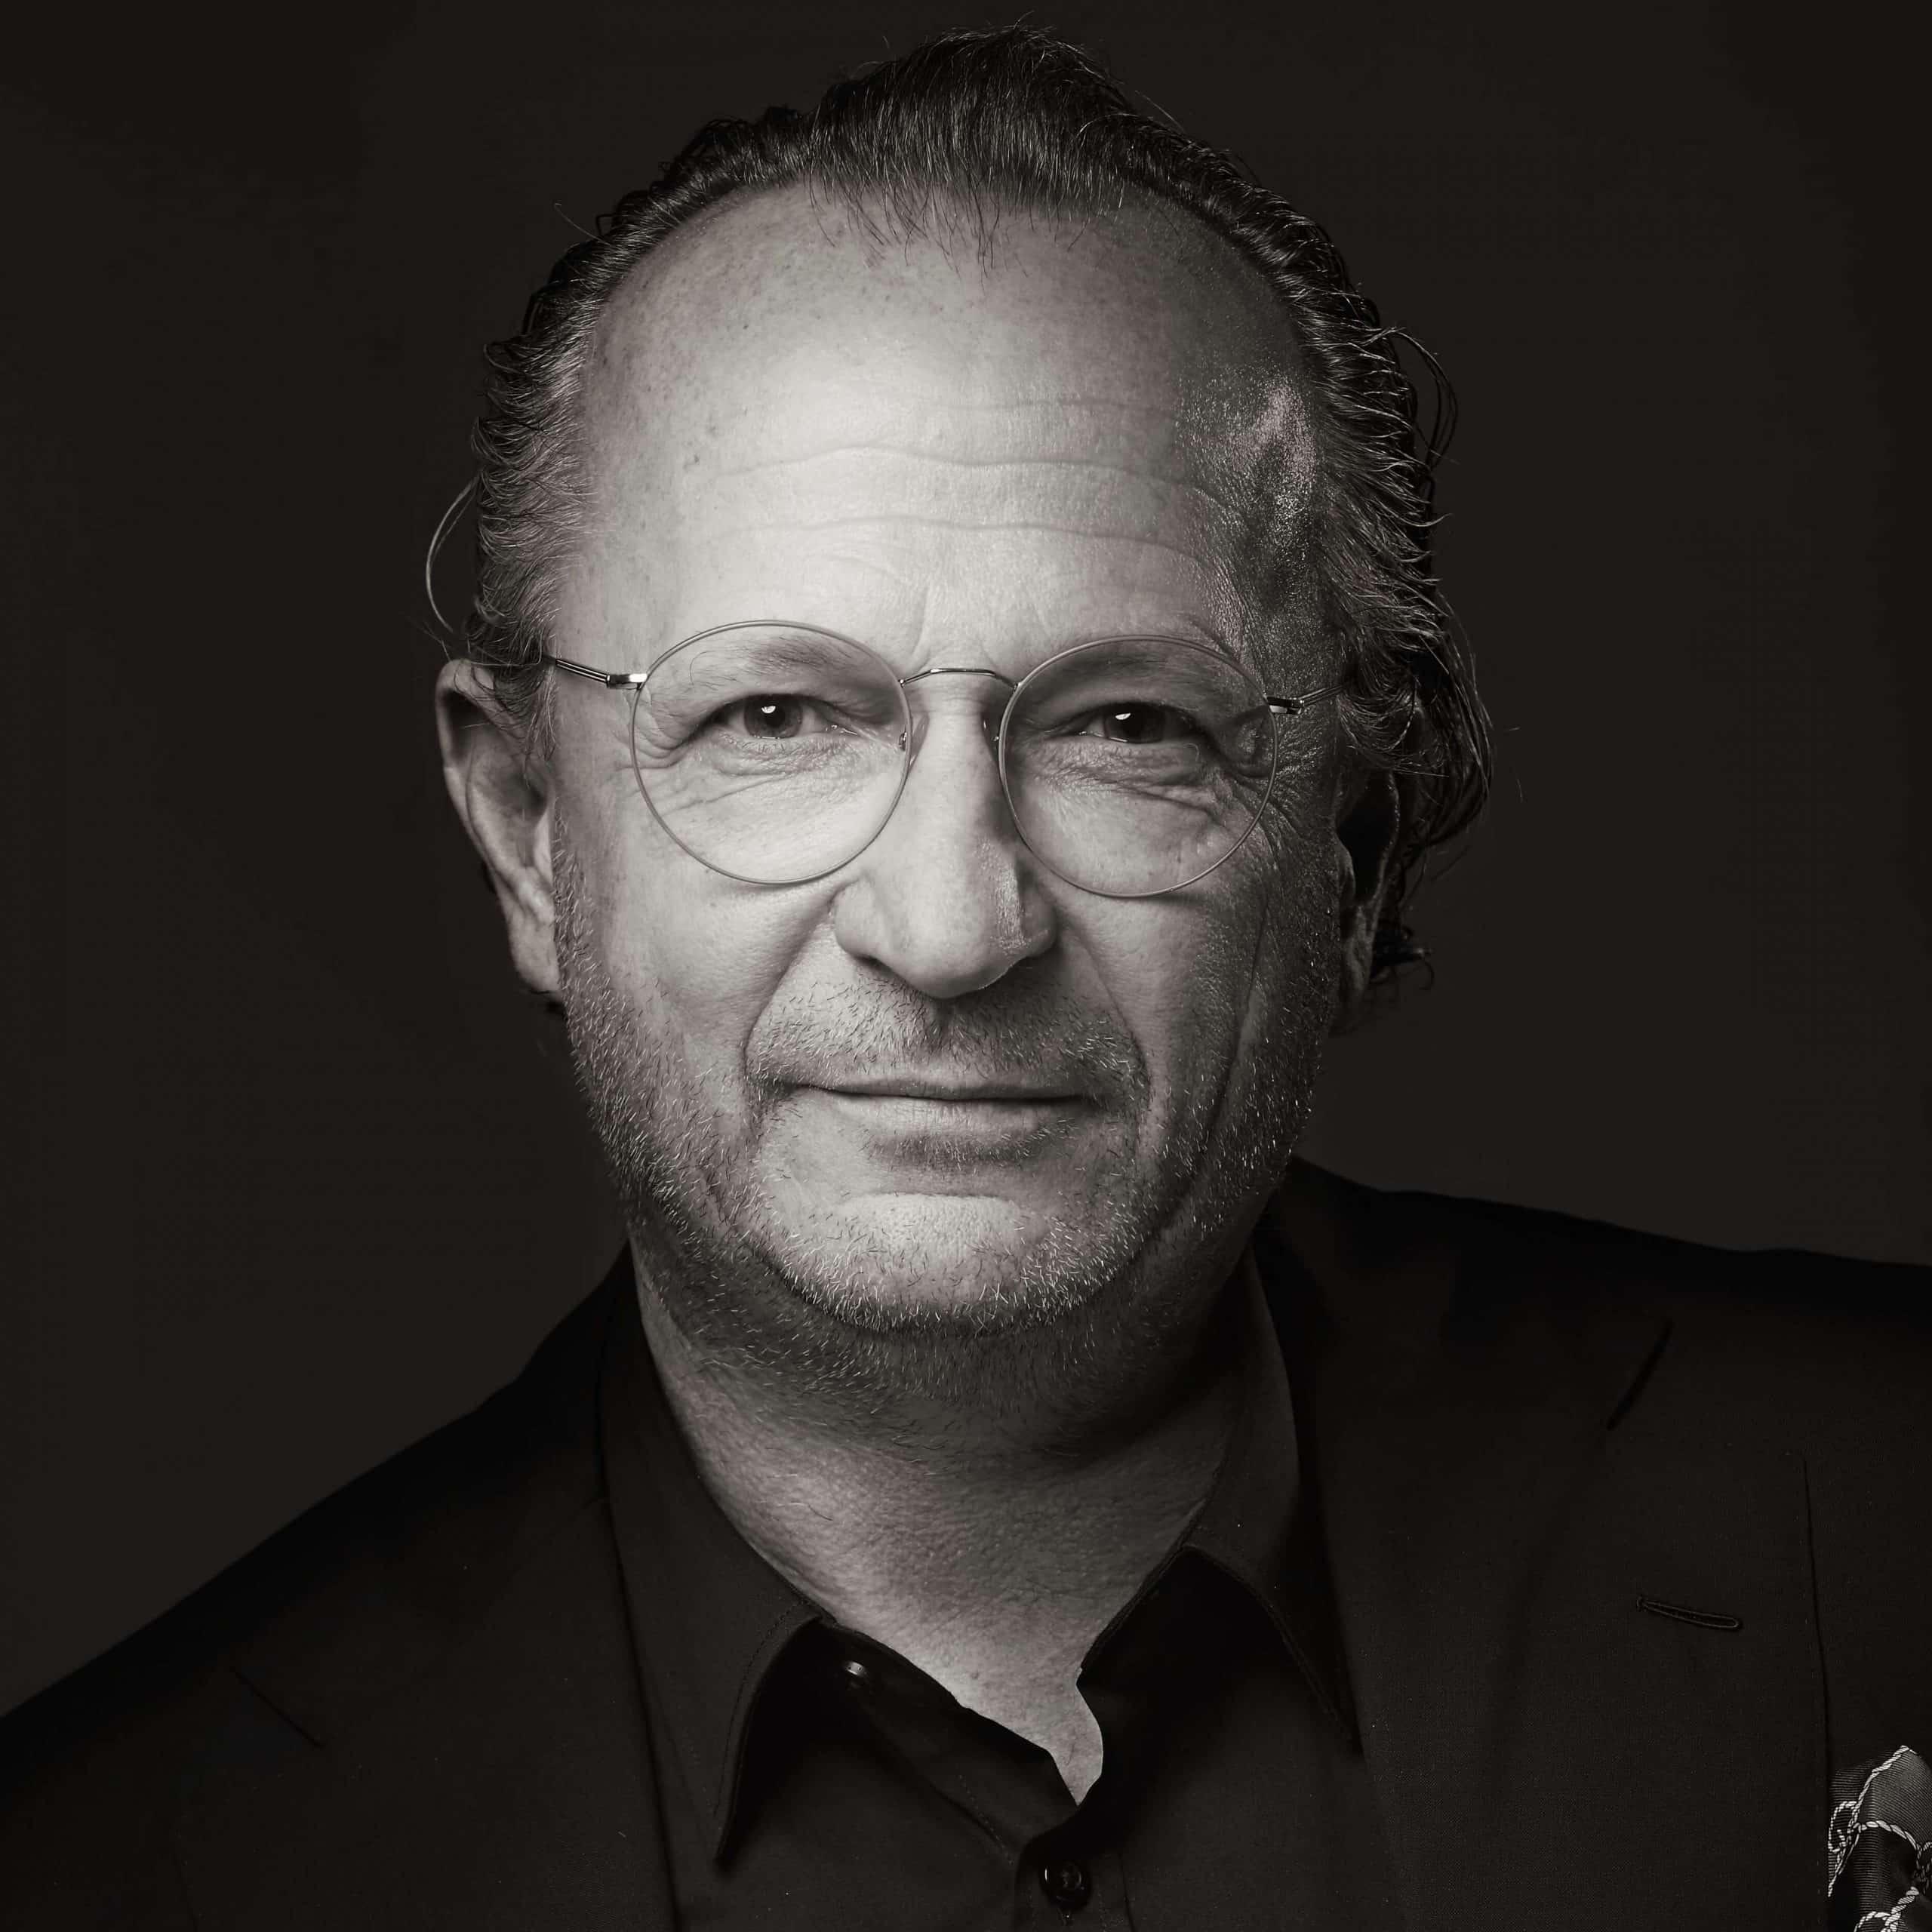 Thorsten Kalmutzke